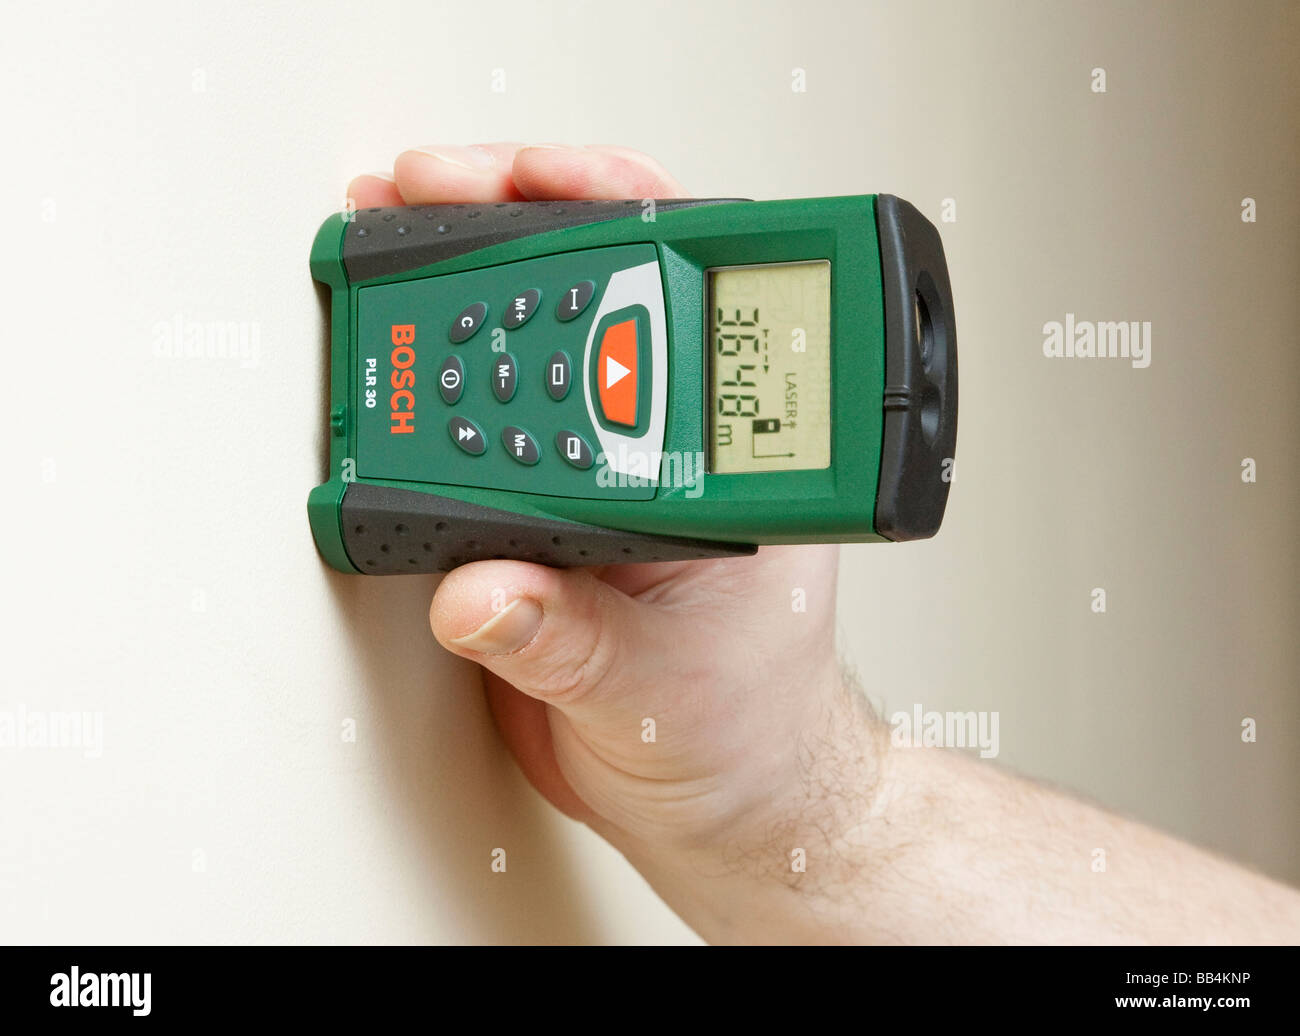 Digitaler Entfernungsmesser : Bosch digitaler laser entfernungsmesser stockfoto bild